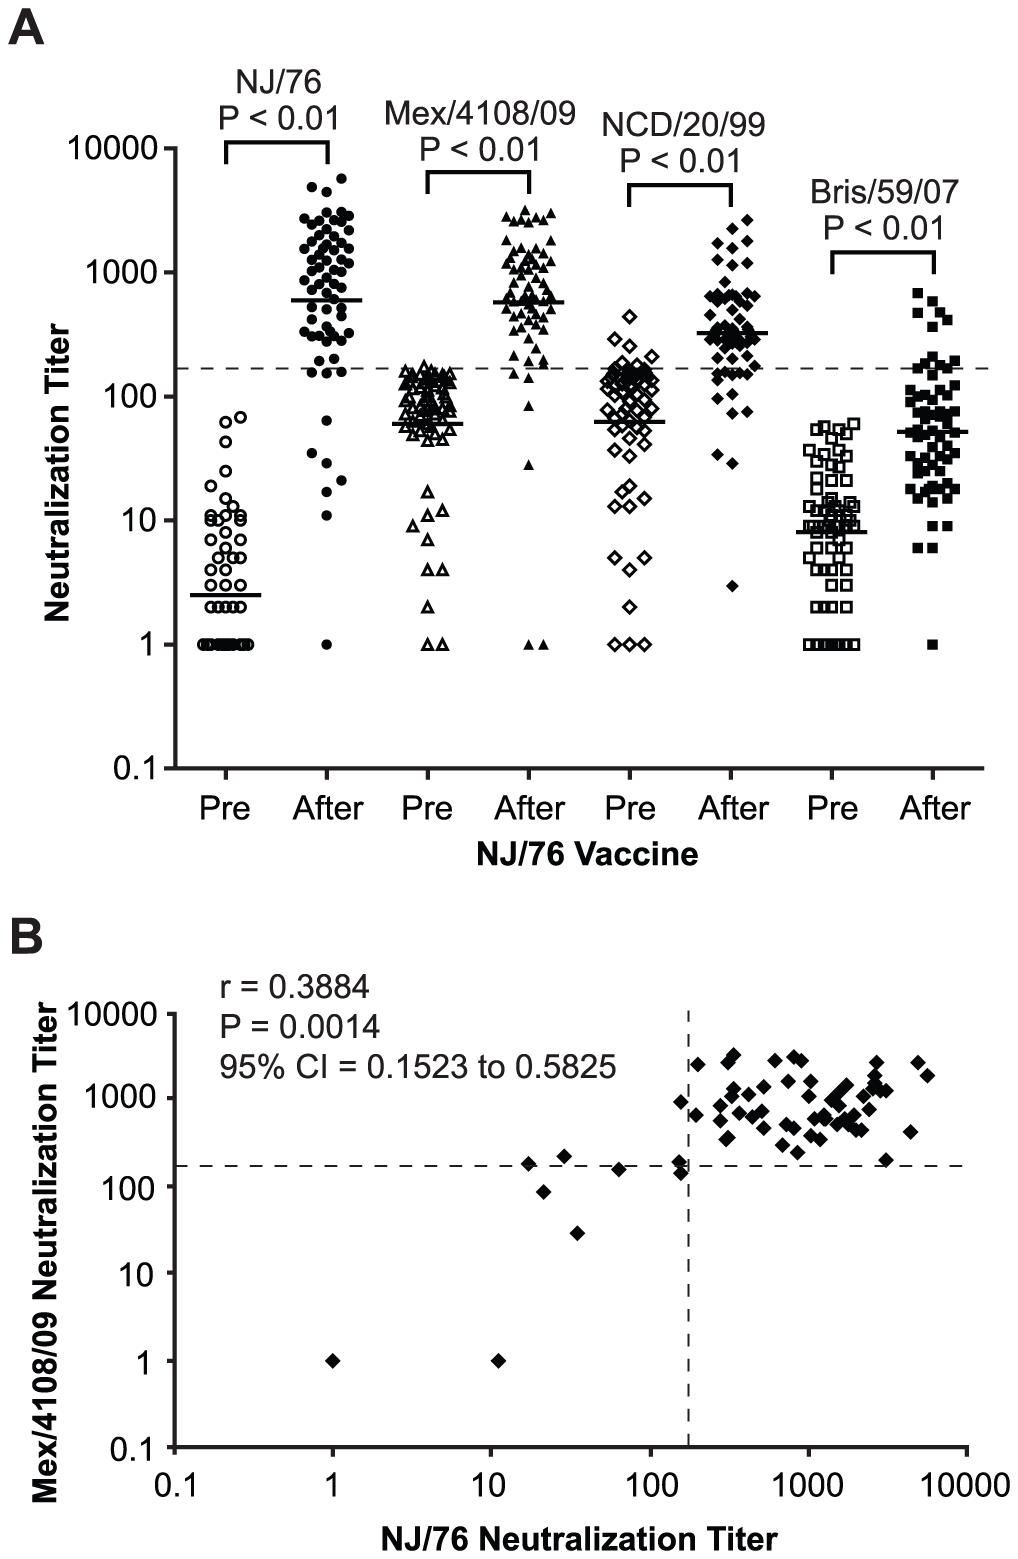 NJ/76 (swine flu) vaccination generates cross-neutralizing antibodies to 2009 H1N1 and seasonal influenza NCD/20/99.